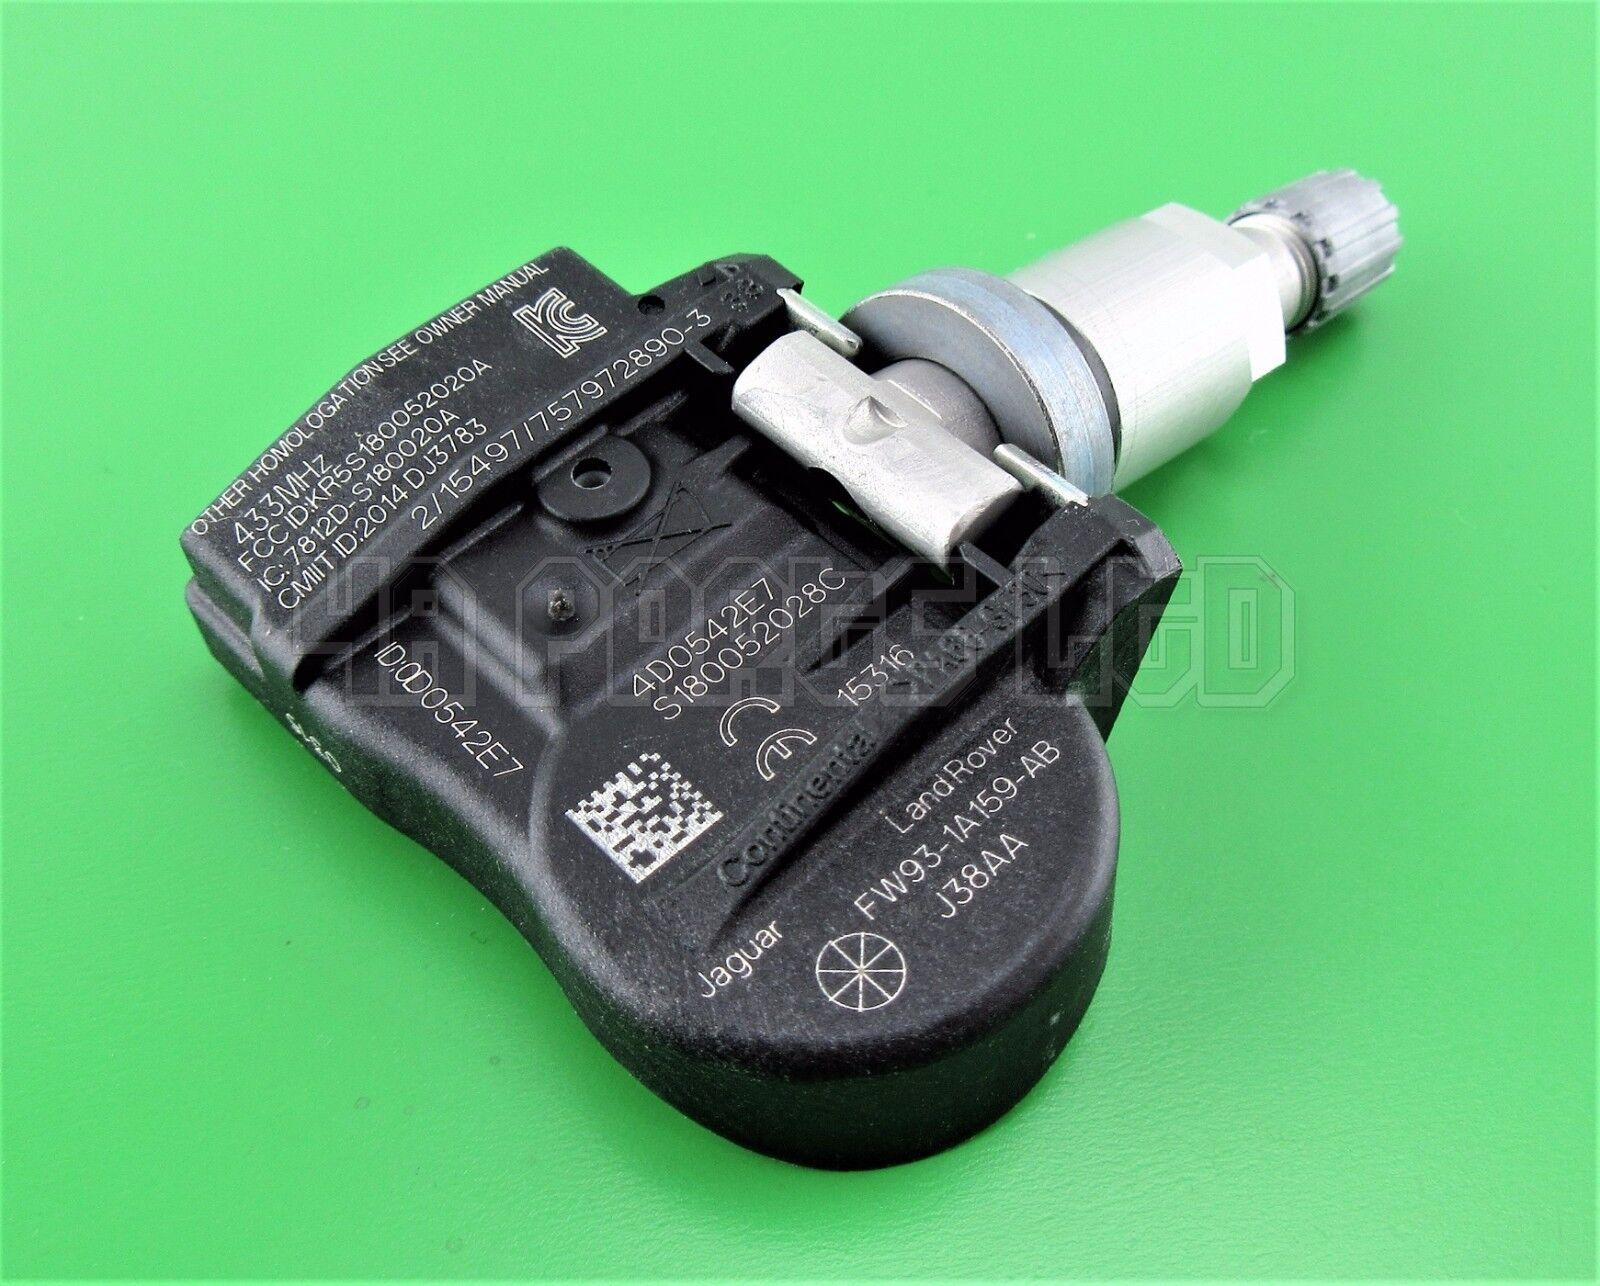 4 pressione pneumatici sensore rdks TPMS PEUGEOT 407 207 307 207 CITROEN c4 c5 c6 c8